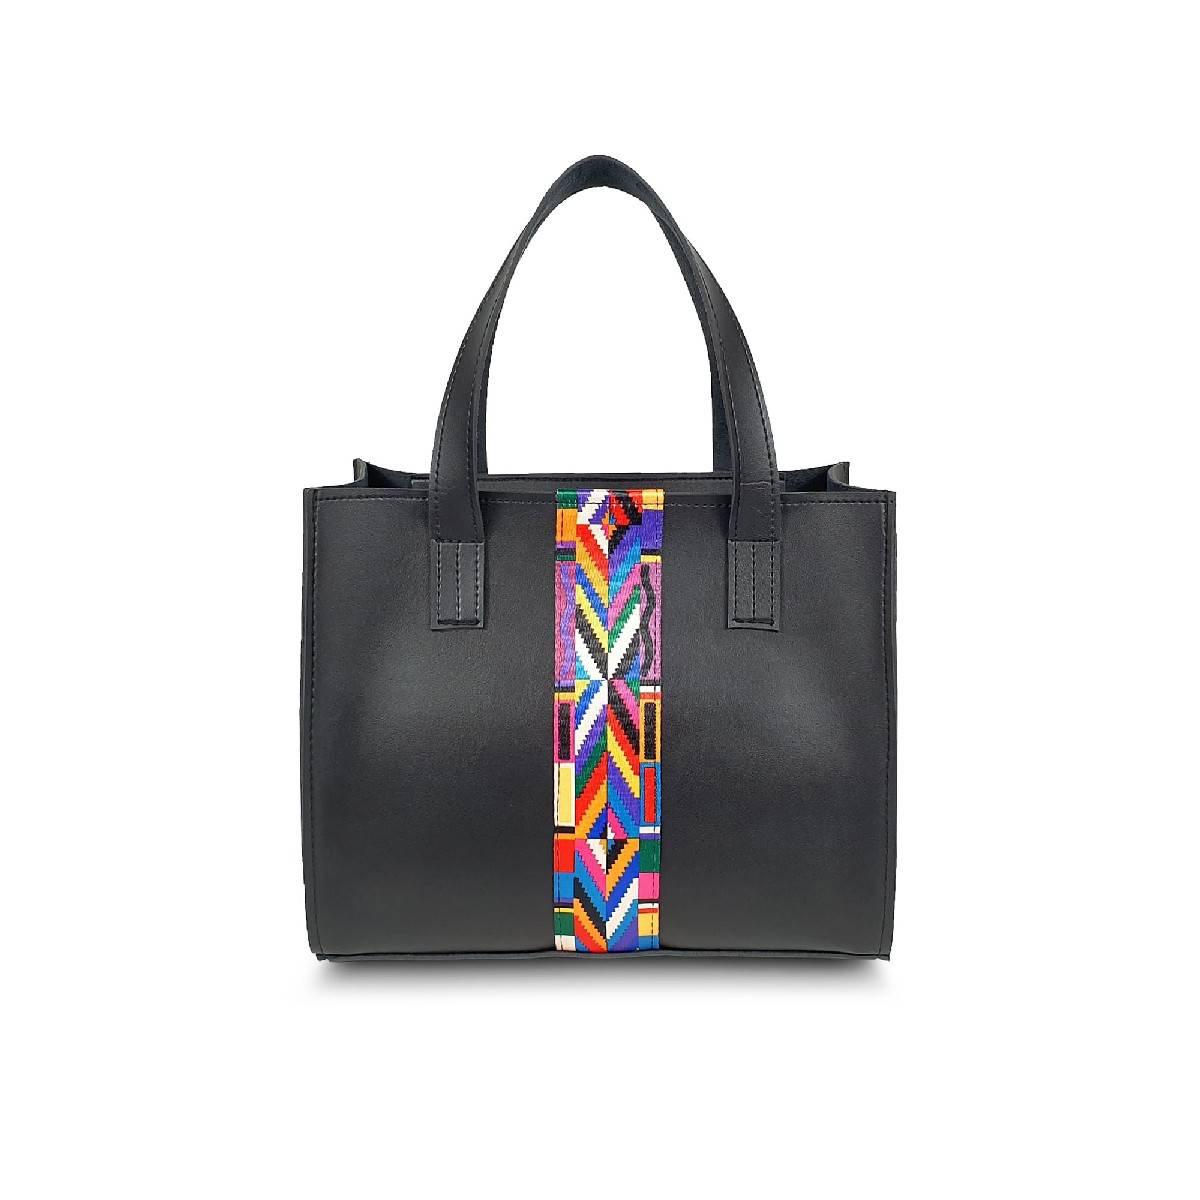 Astore Black Double Compartments Vegan Leather Colorful Aztec Strip Casual Hand Bag Shoulder Bag Cross Body Bag Handle Bag